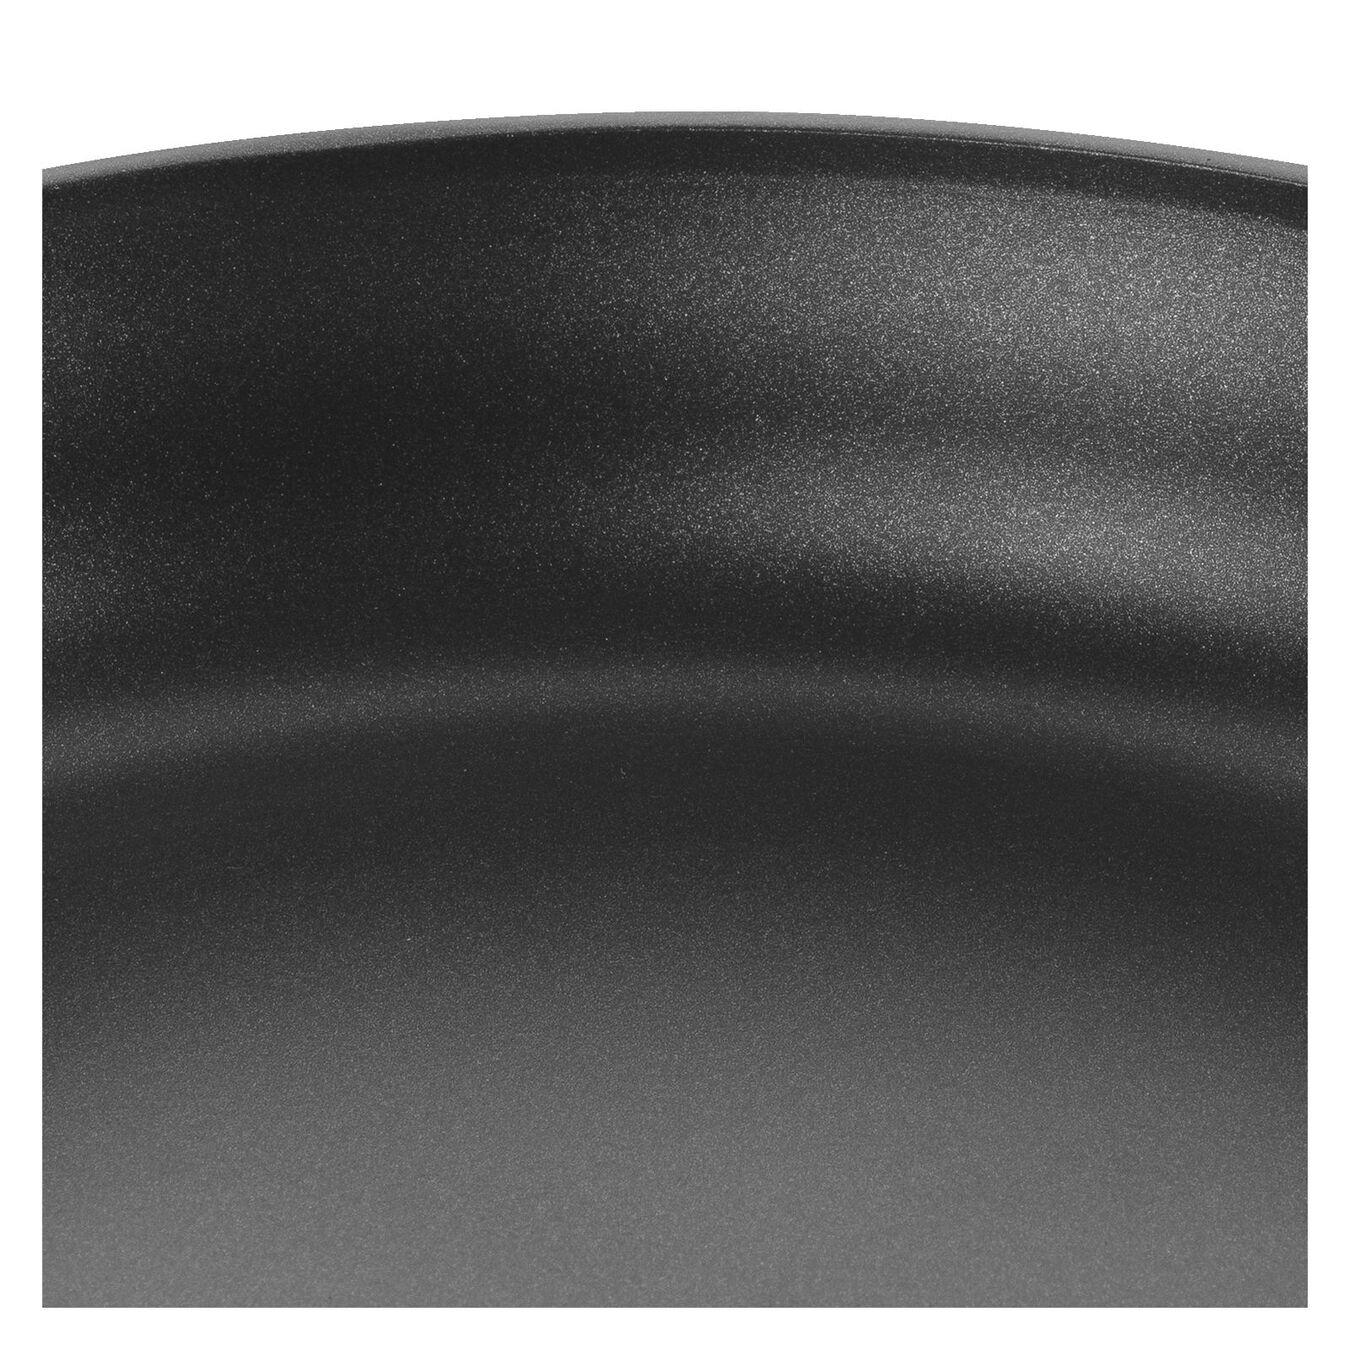 10-inch, aluminium, Non-stick, Hard Anodized Fry Pan,,large 2